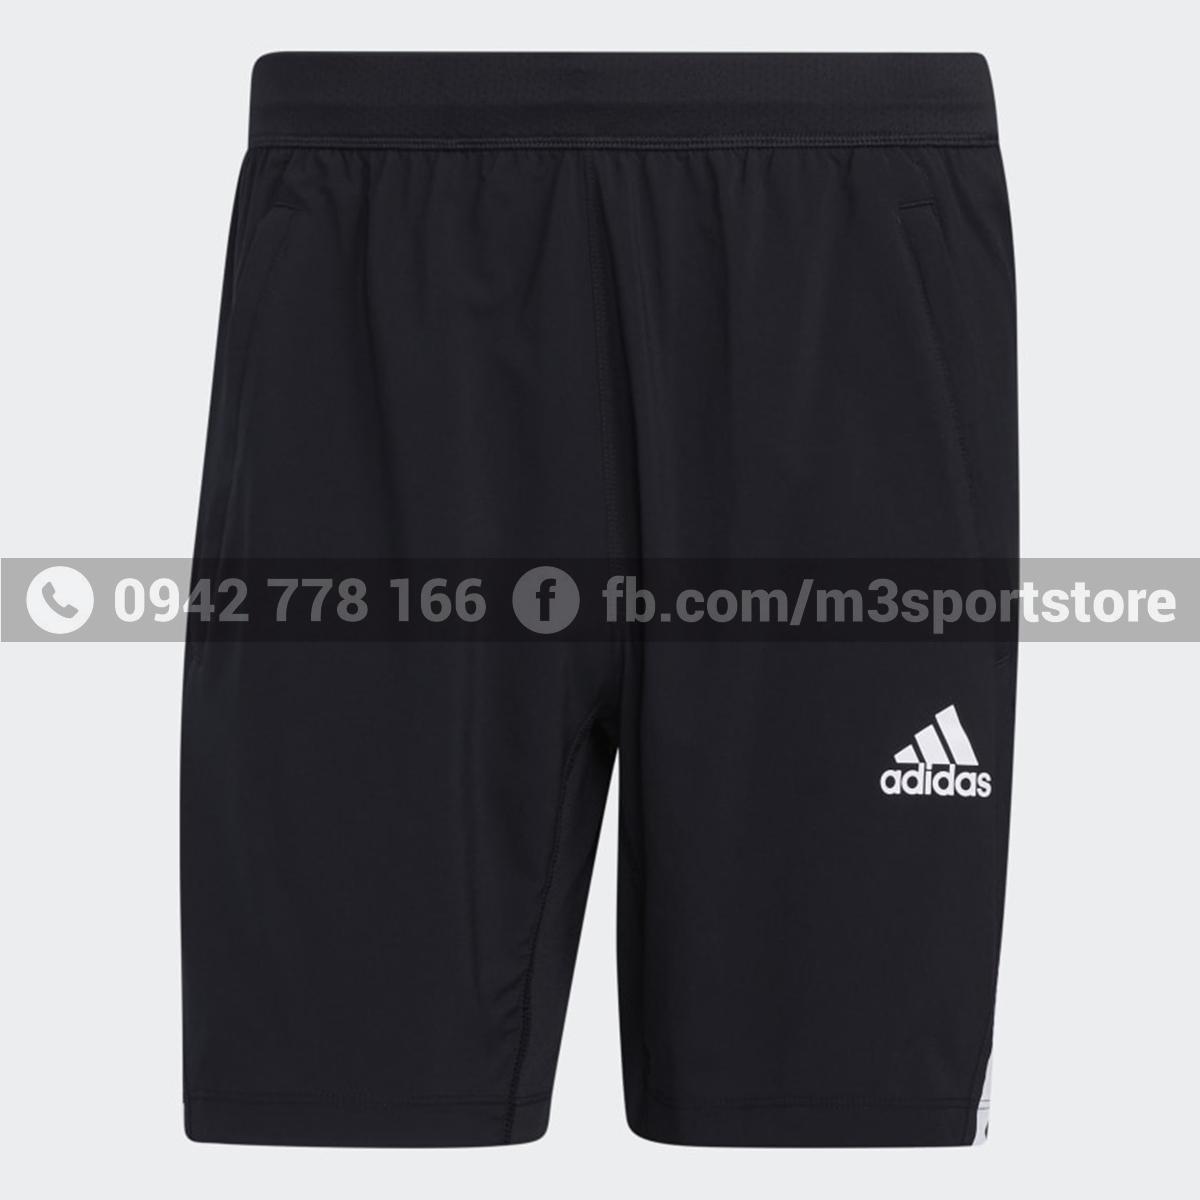 Giầy thể thao nữ Nike Tanjun Black 812655-011